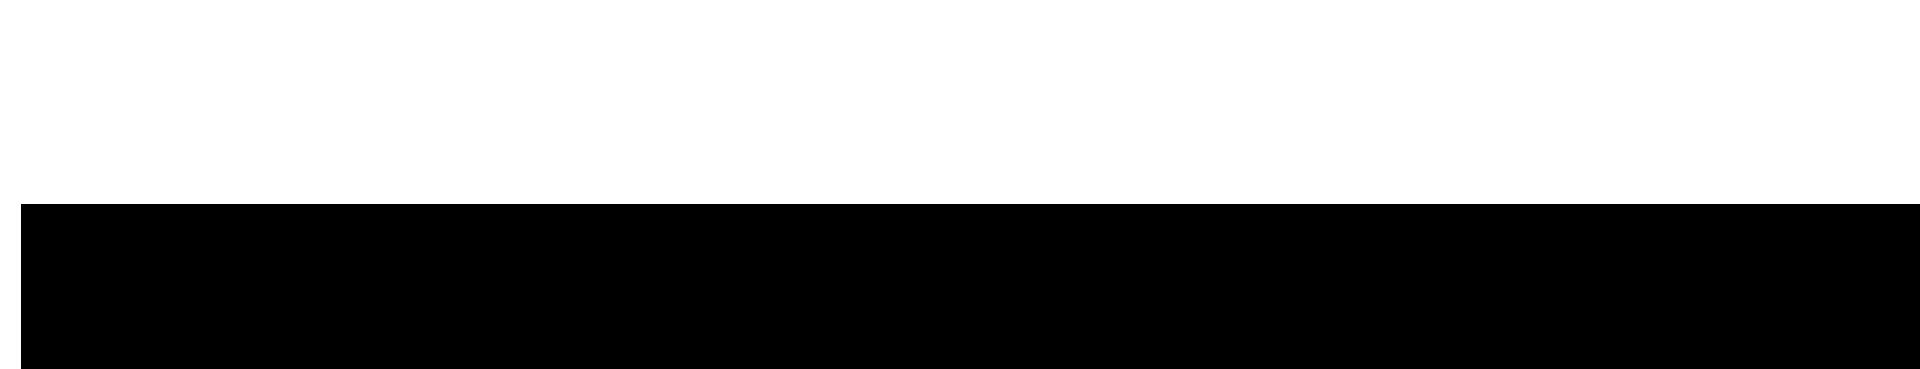 Fortnox Ascendo